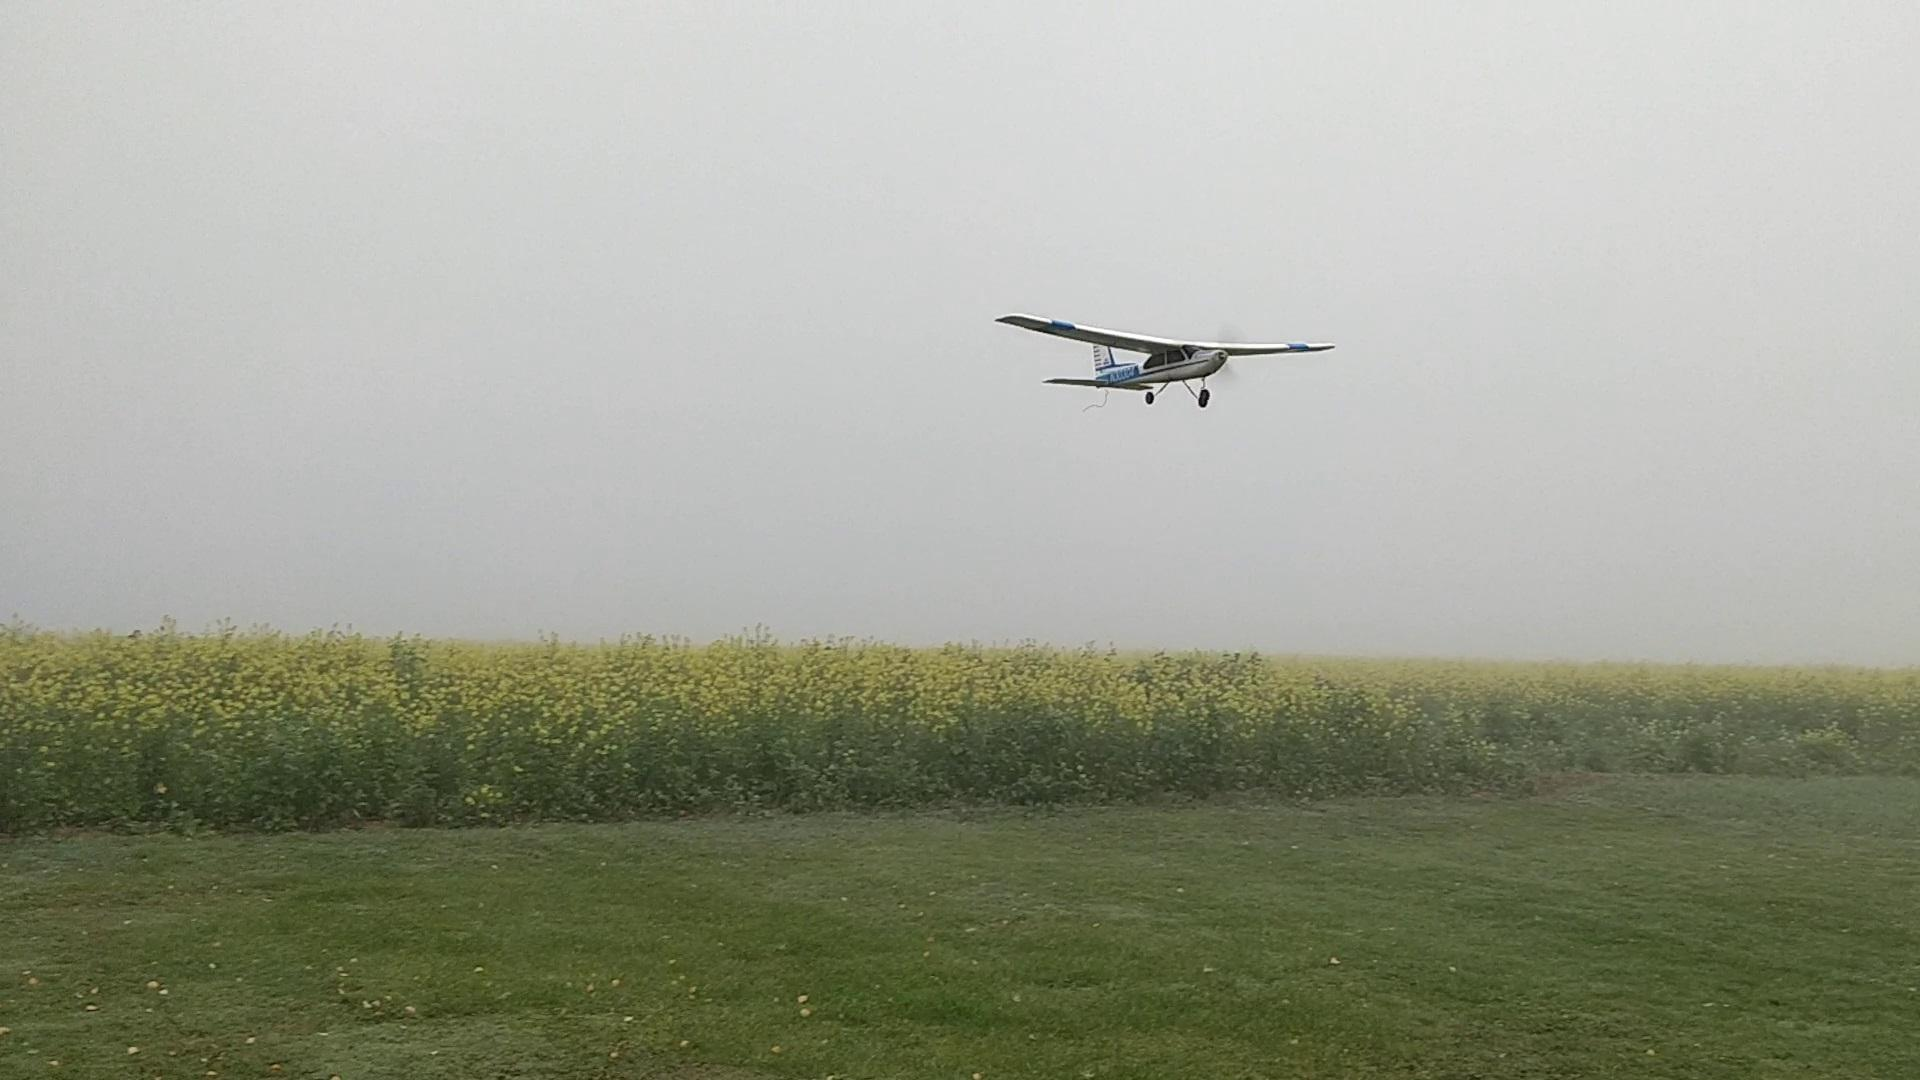 Modellflug im Nebel